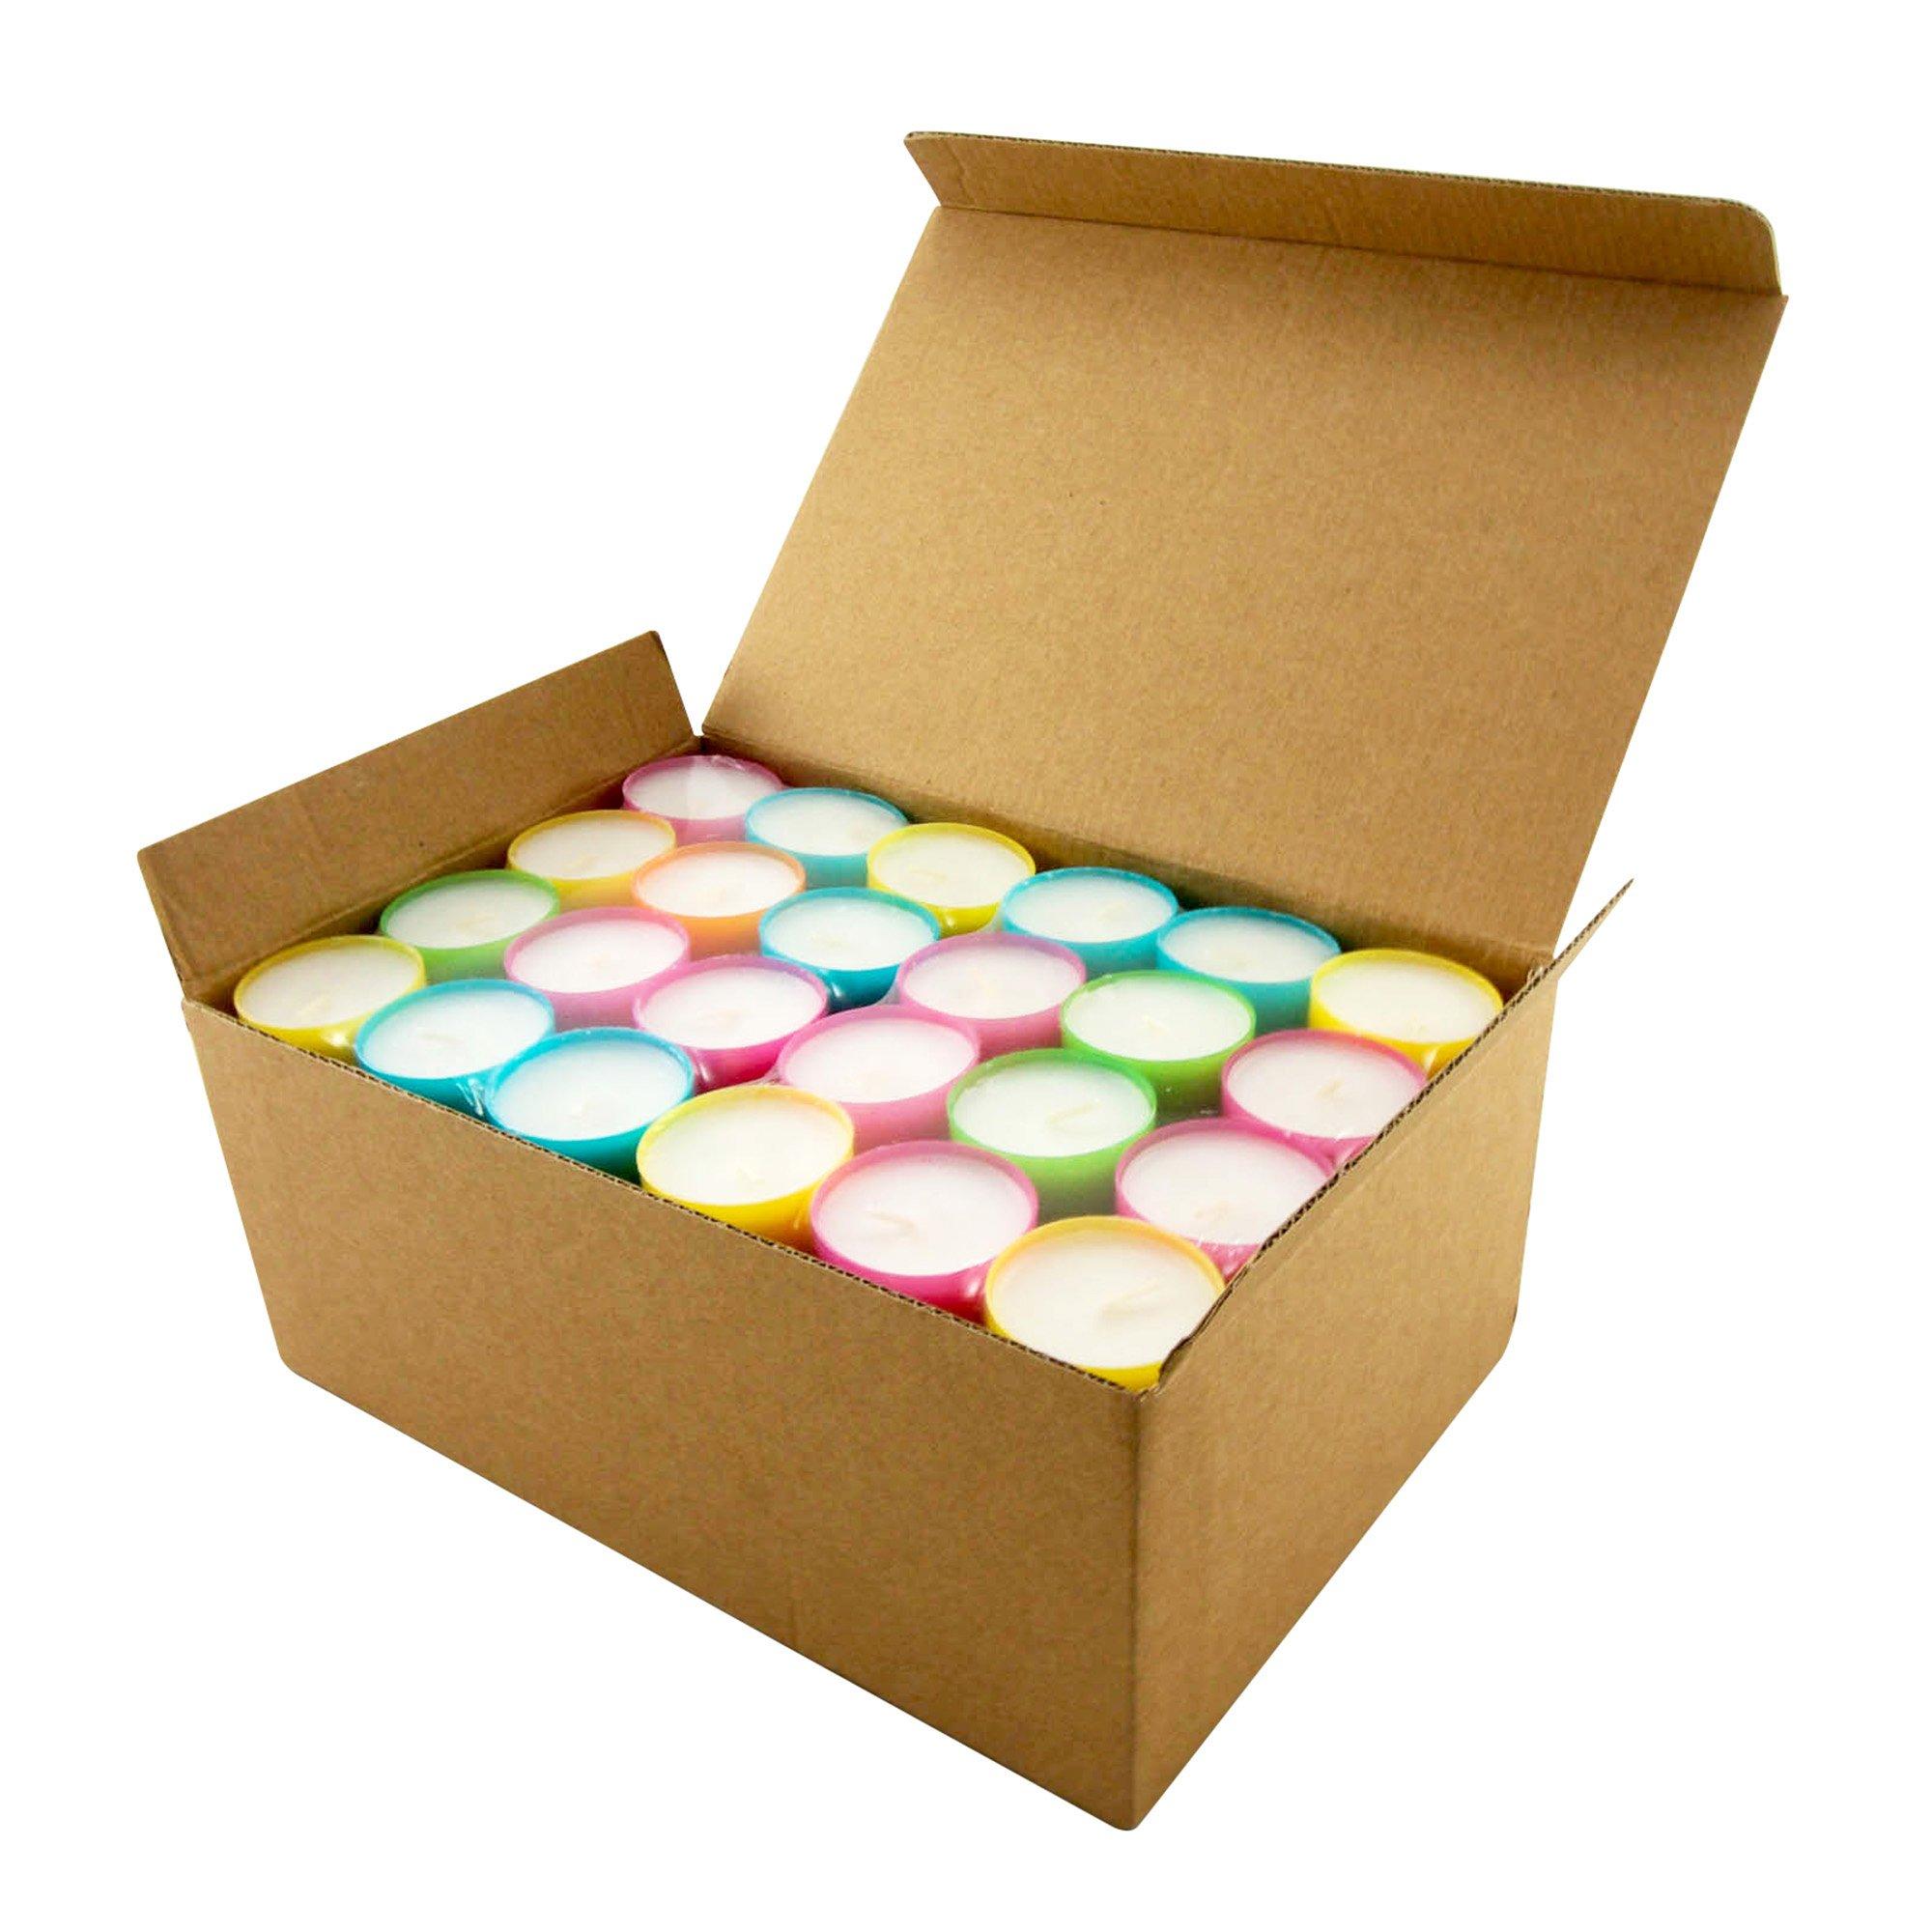 Stonebriar Multicolor Tea Light Candles - 6 to 7 Hr Extended Burn Time - 96 Pack